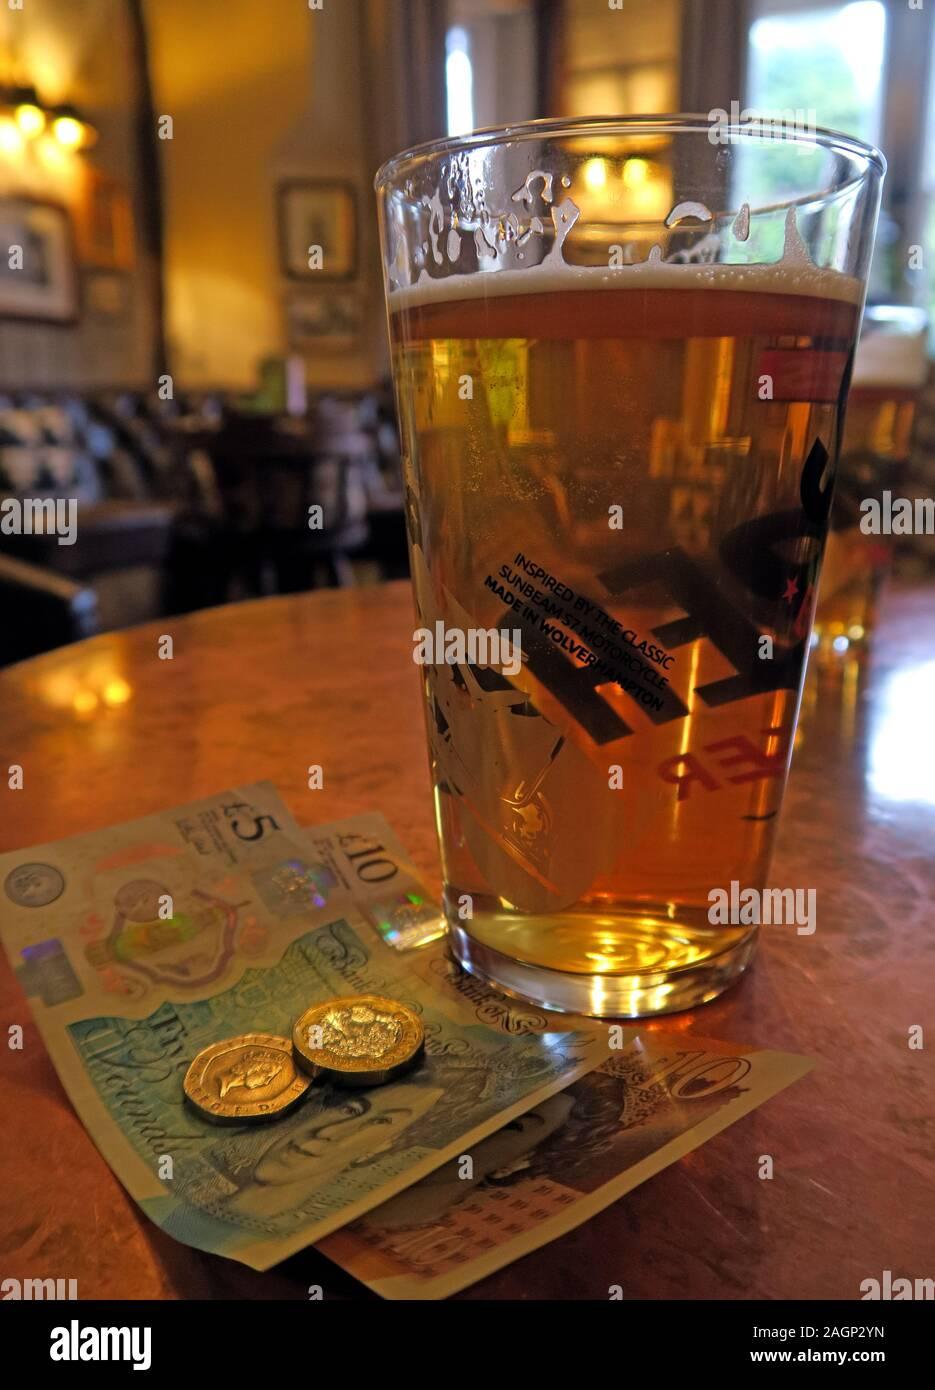 Dieses Stockfoto: Pint Bier, UK Sterling Geld, englische Banknoten, Bargeld - 2AGP2Y